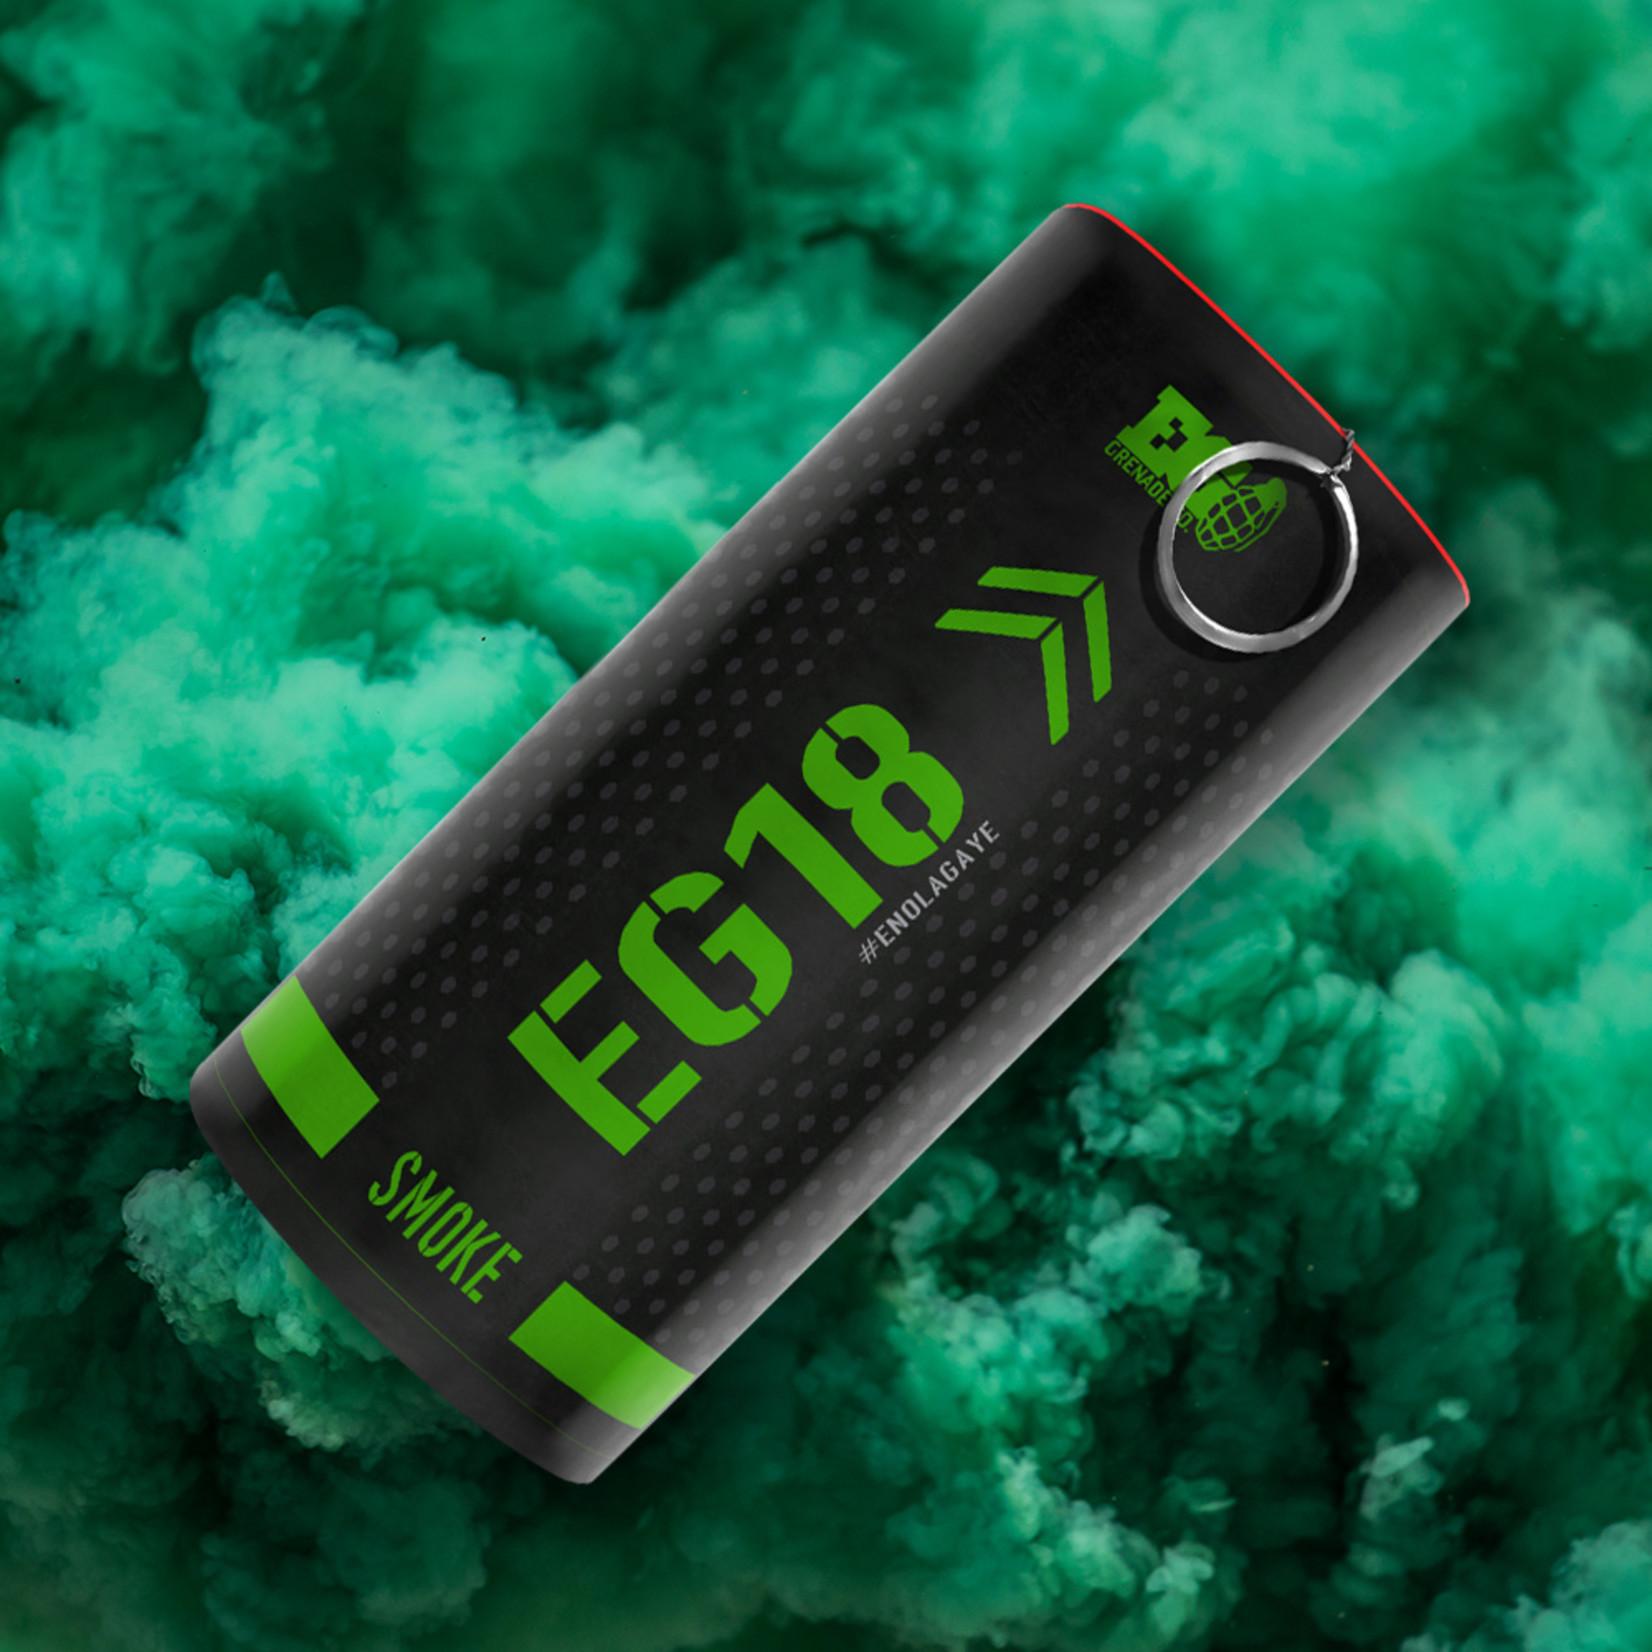 EG18 - Green Smoke Grenade